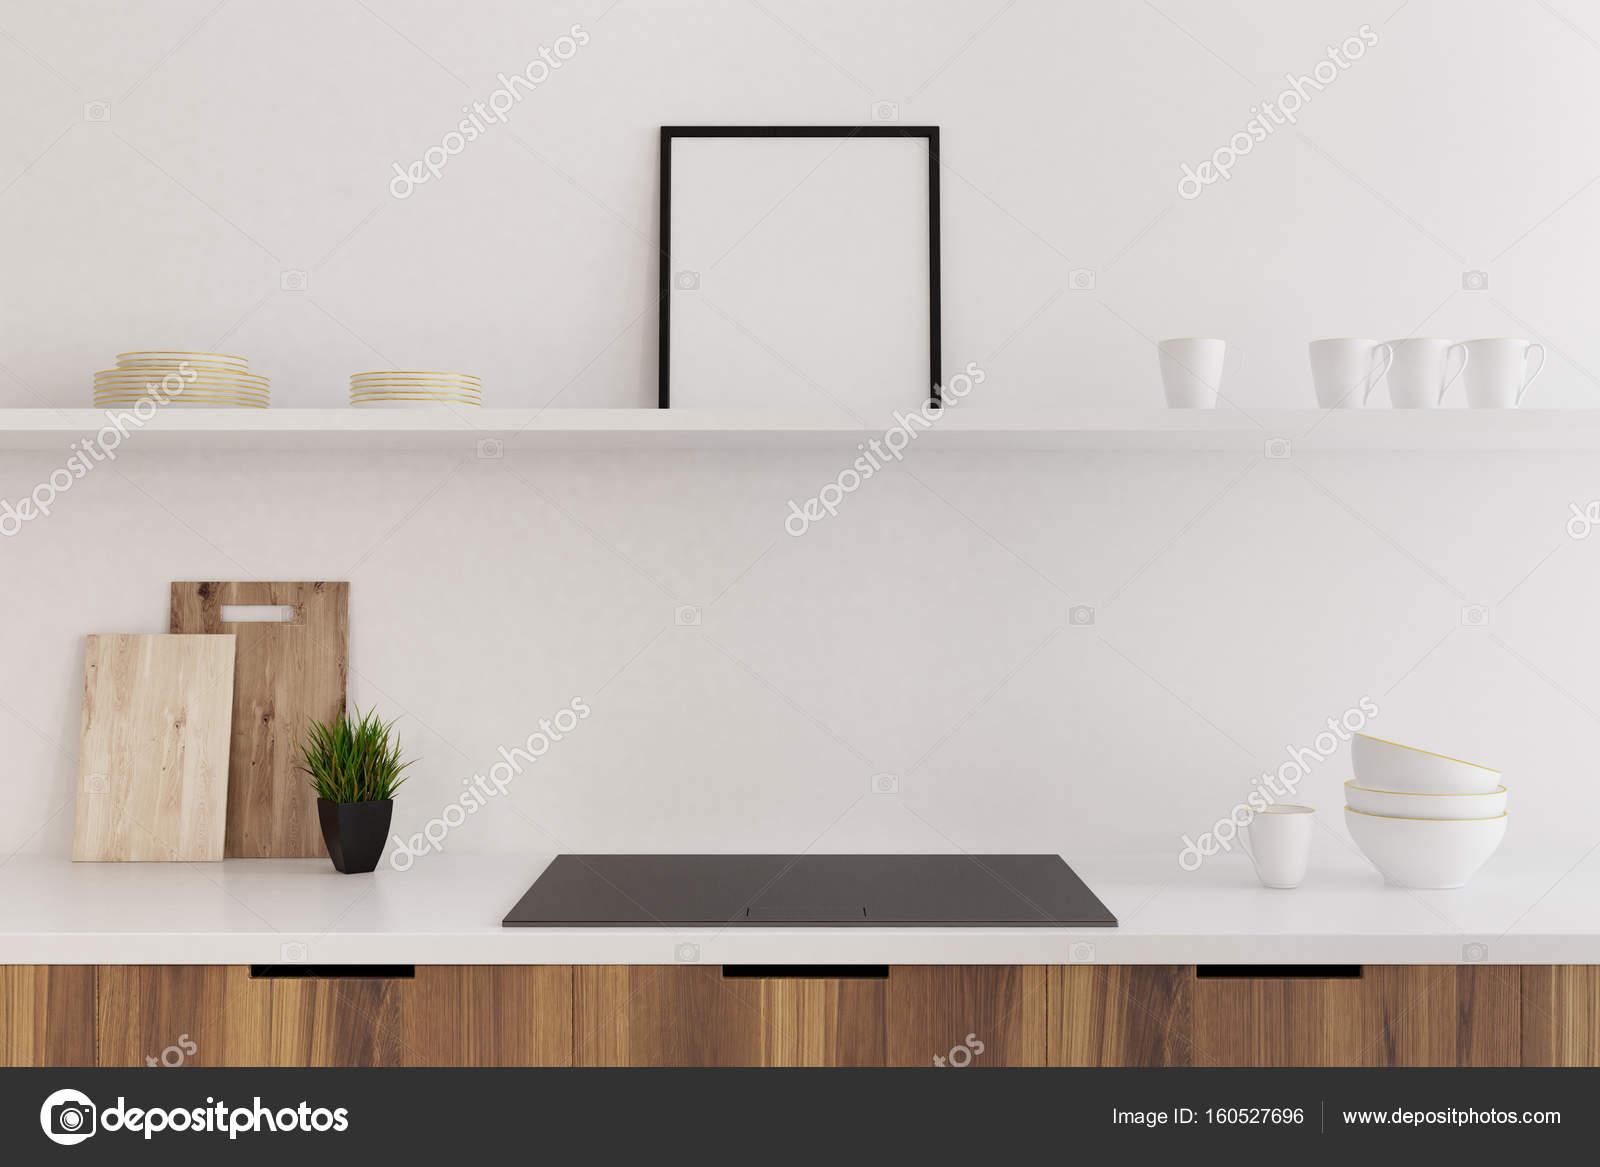 Marmer bar witte keuken oven poster close up u stockfoto